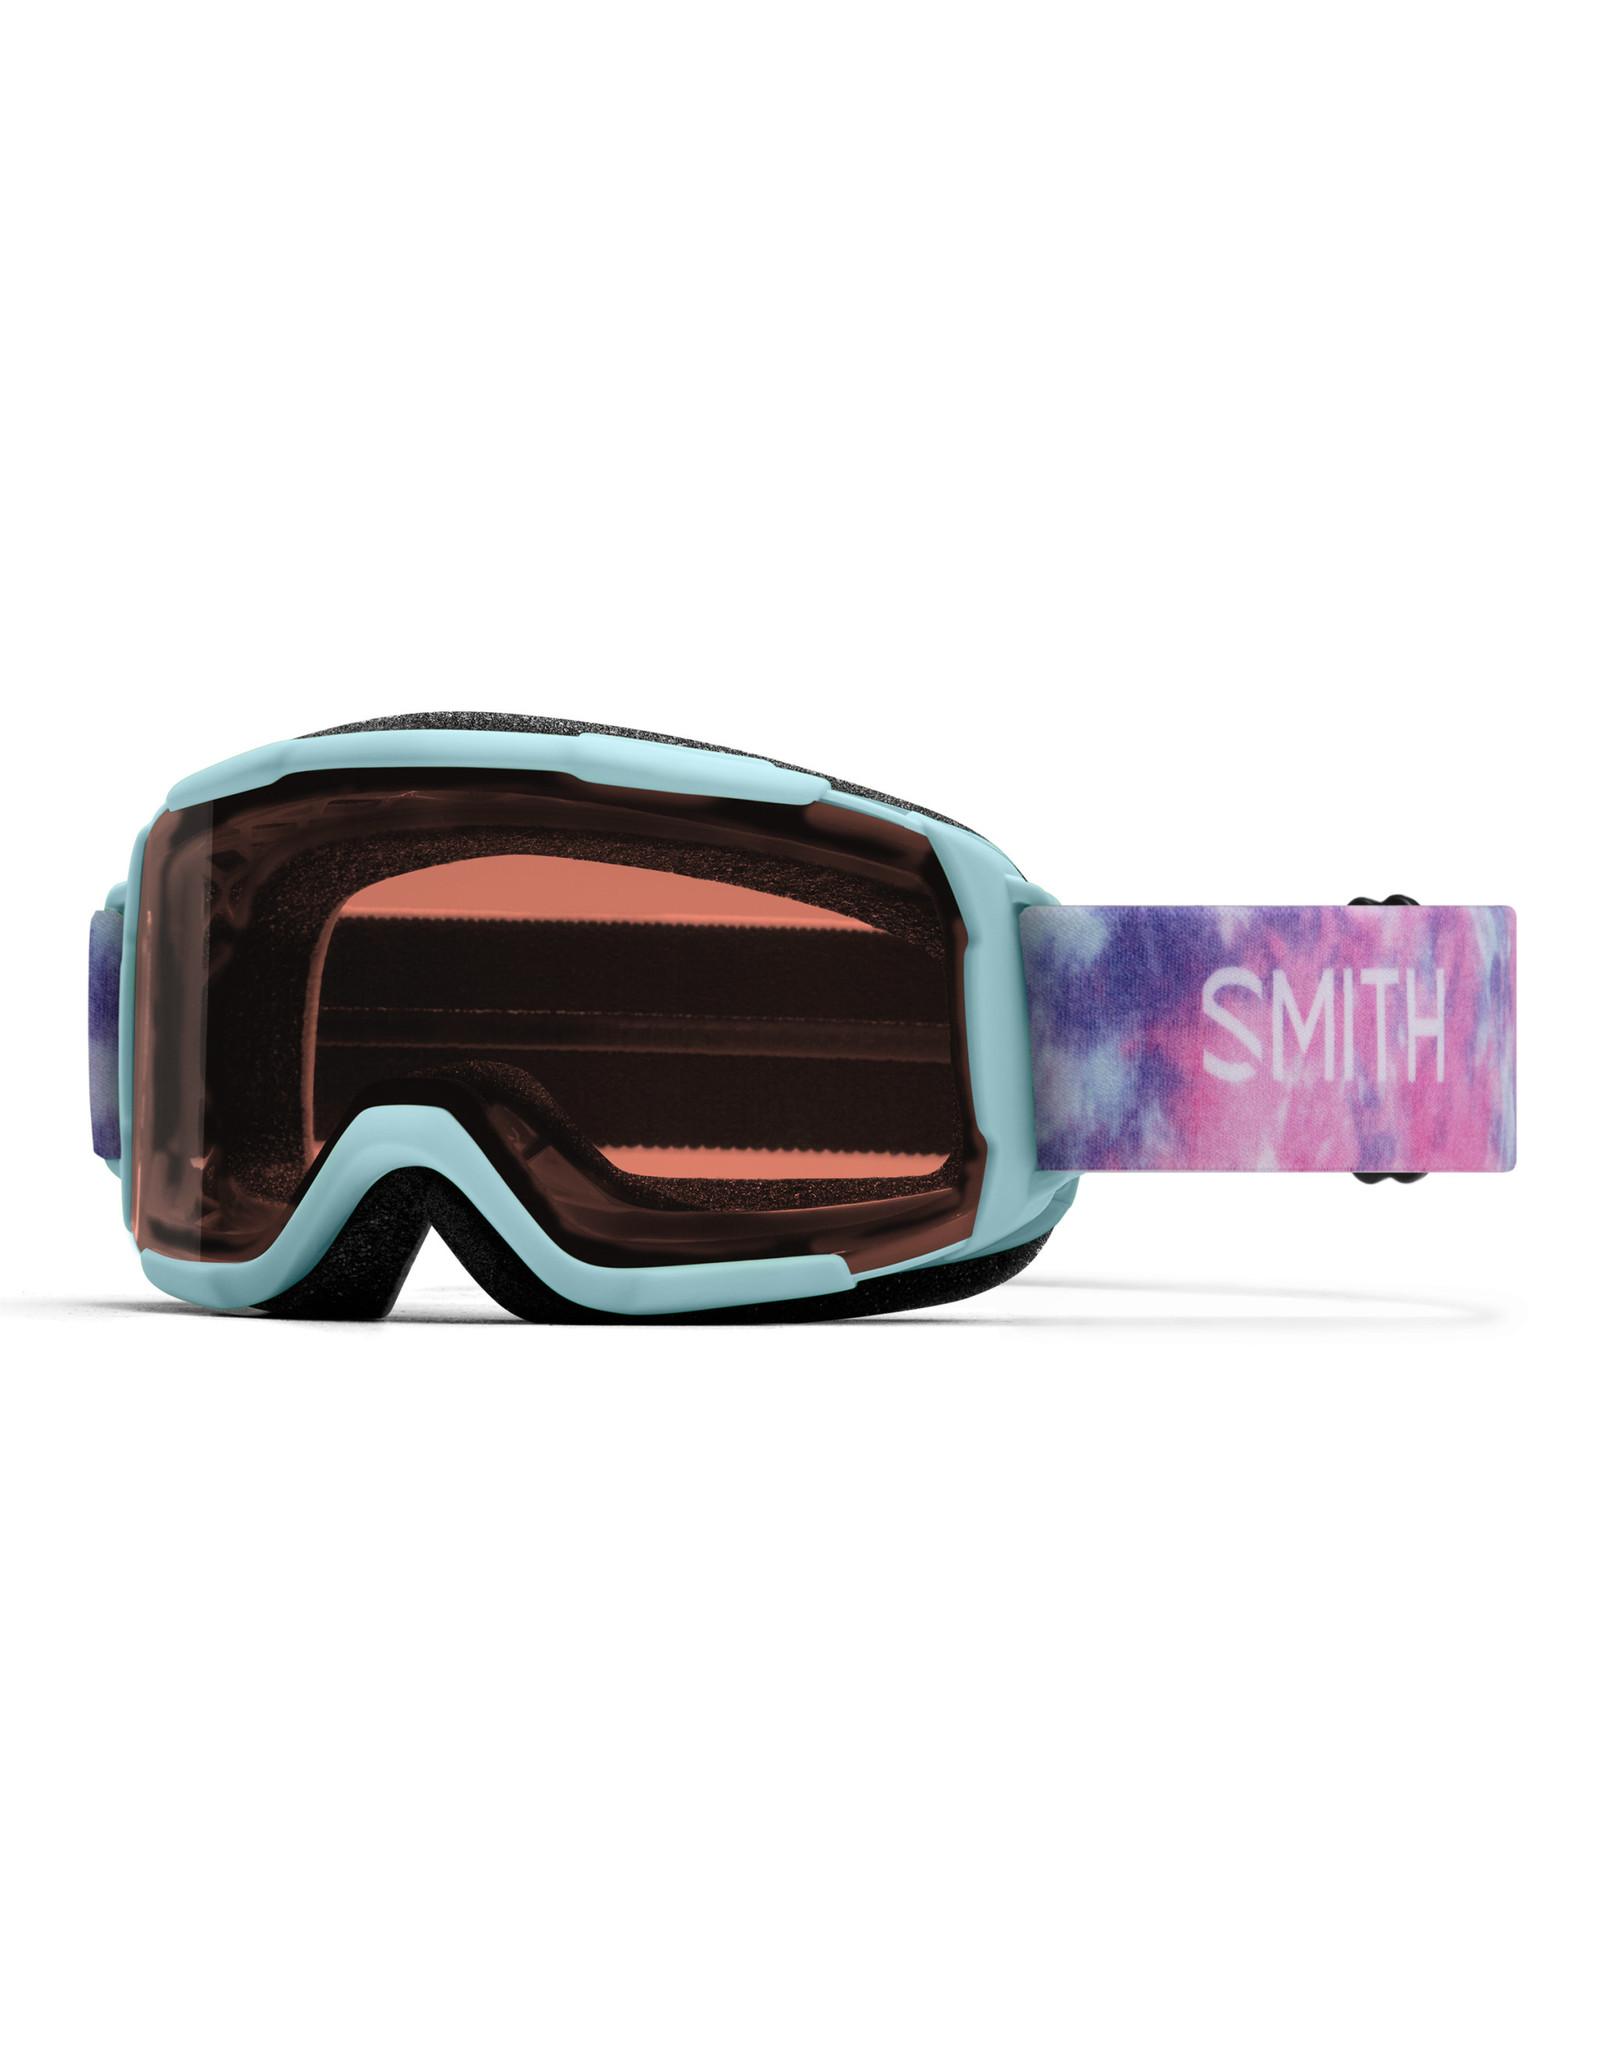 Smith SMITH DAREDEVIL POLAR TIE DYE 20 SKI GOGGLE YOUTH